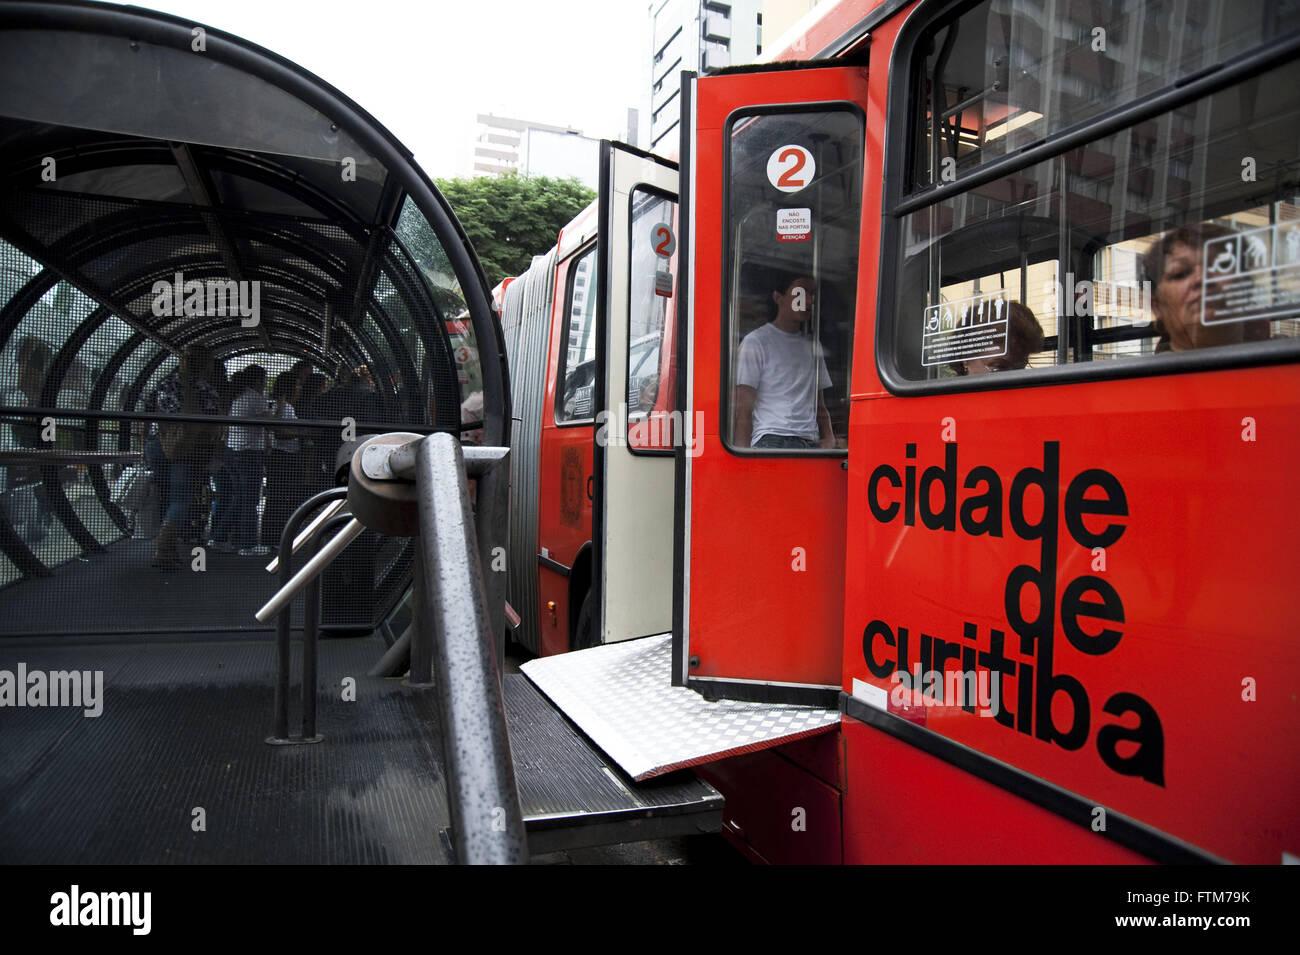 Public transport in Curitiba - Stock Image